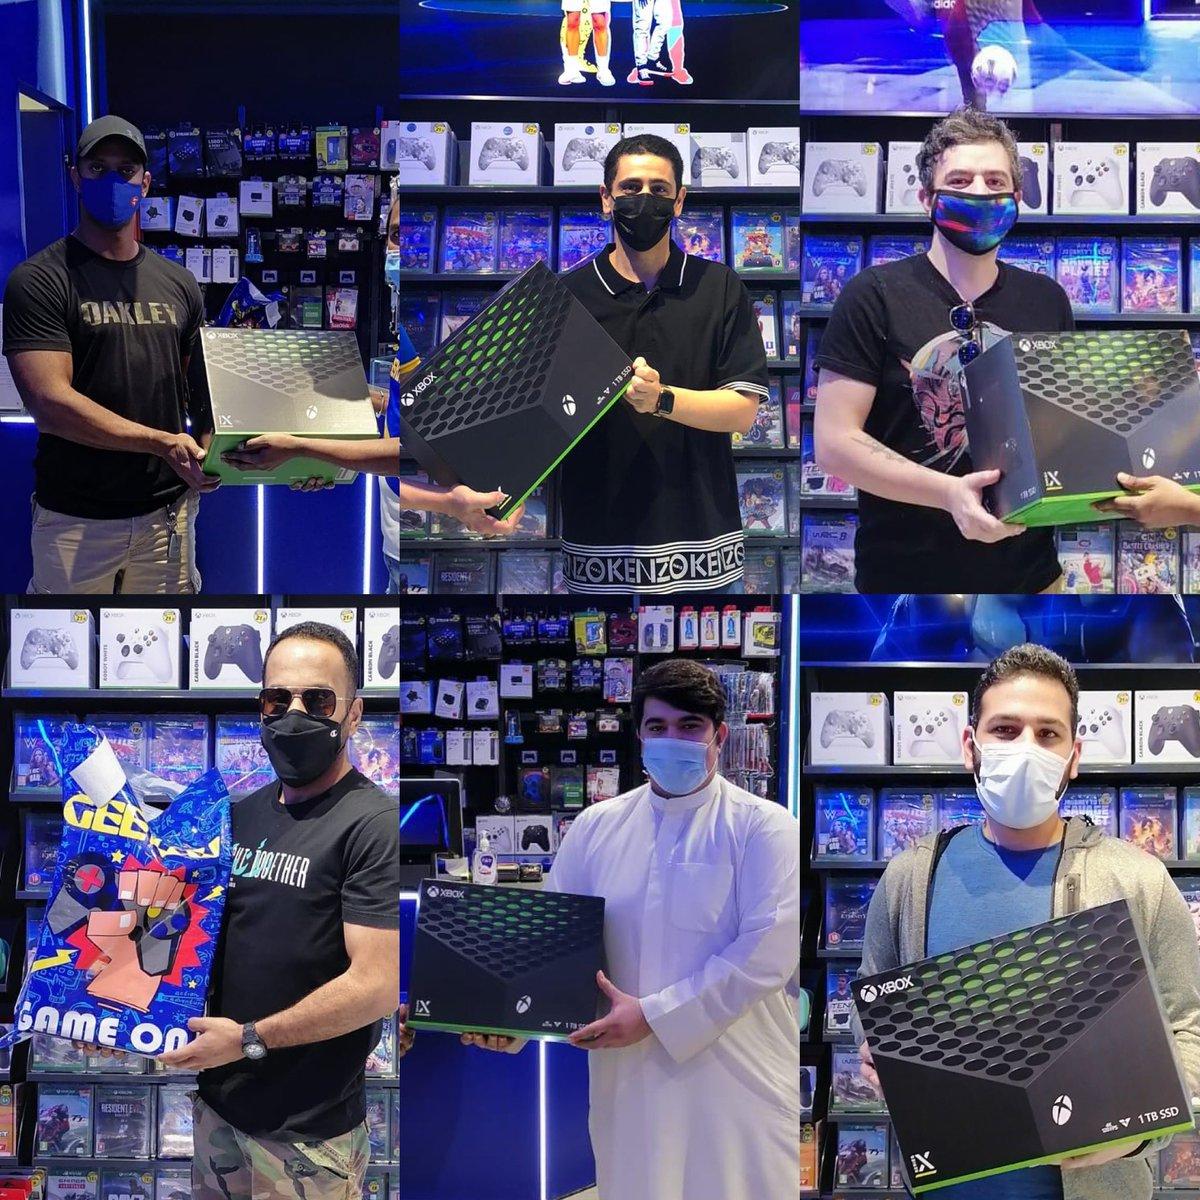 #Xboxseriesx Kuwaiti fans @XboxGulf https://t.co/SMl7JTS4cN